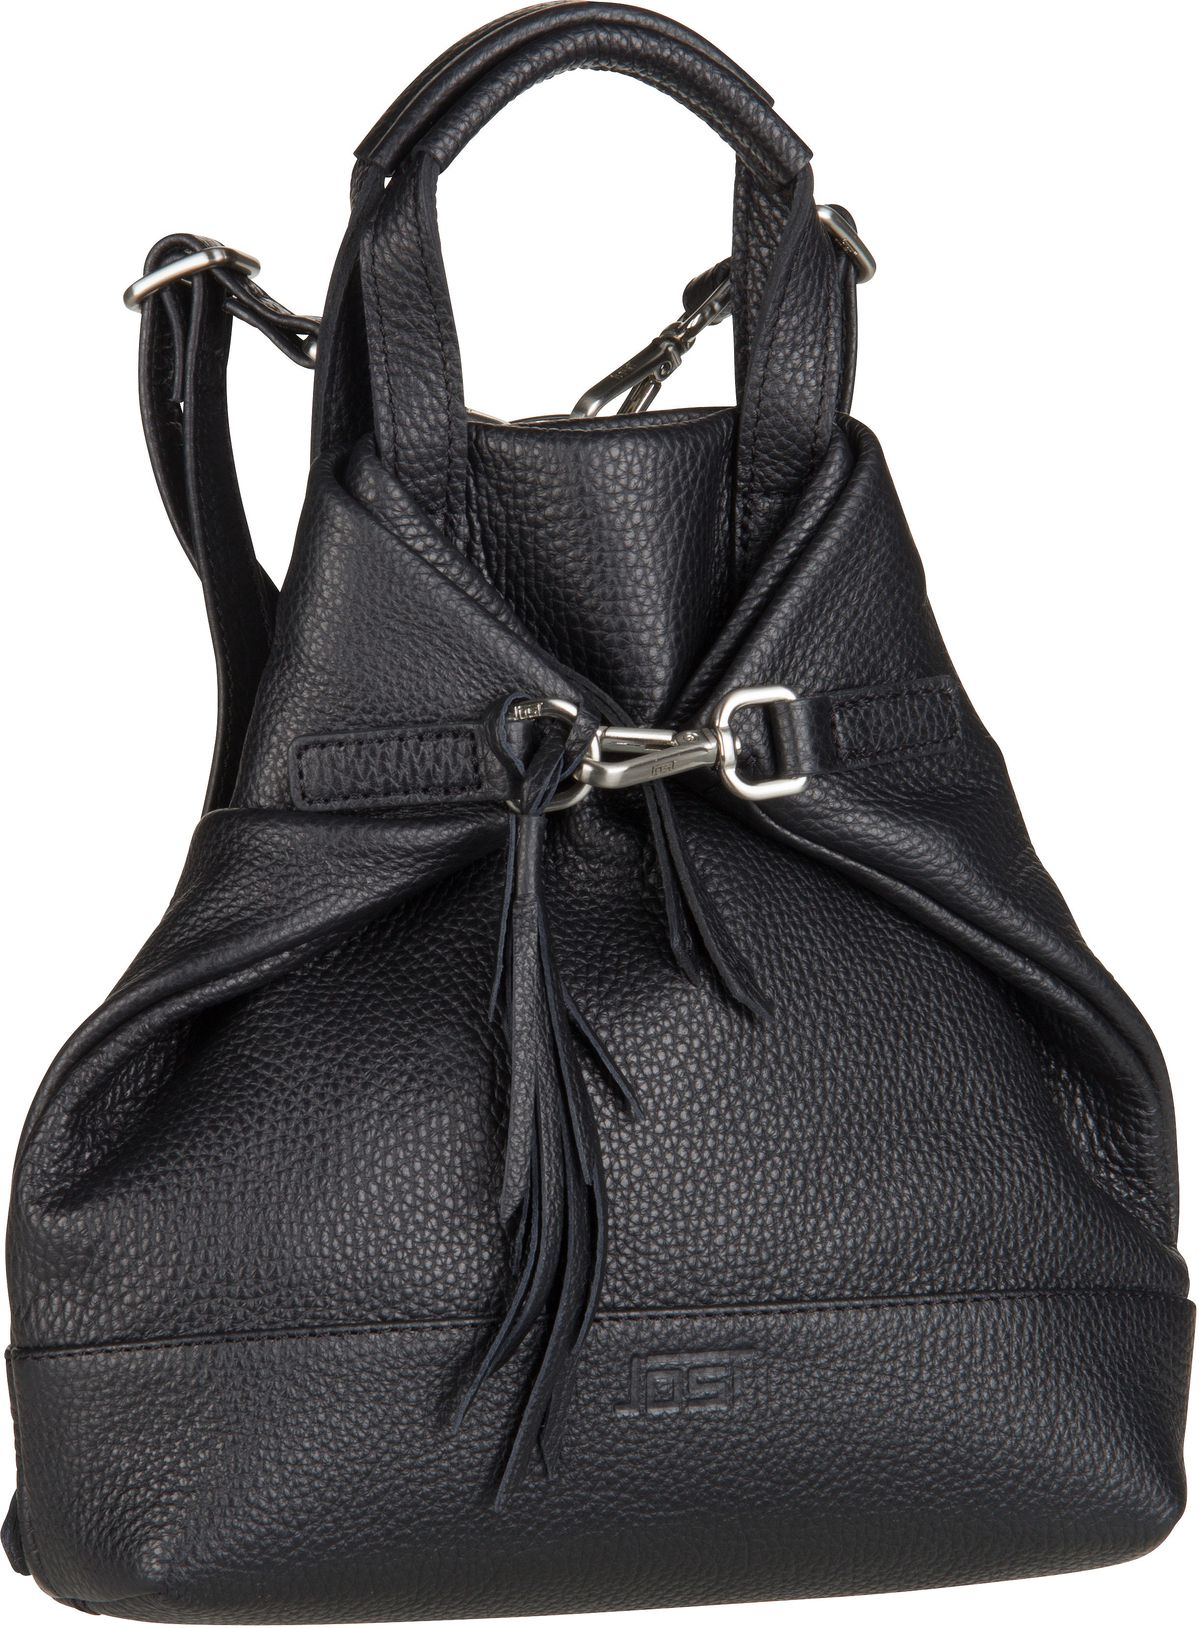 Rucksack / Daypack Vika 1840 X-Change Bag Mini Schwarz